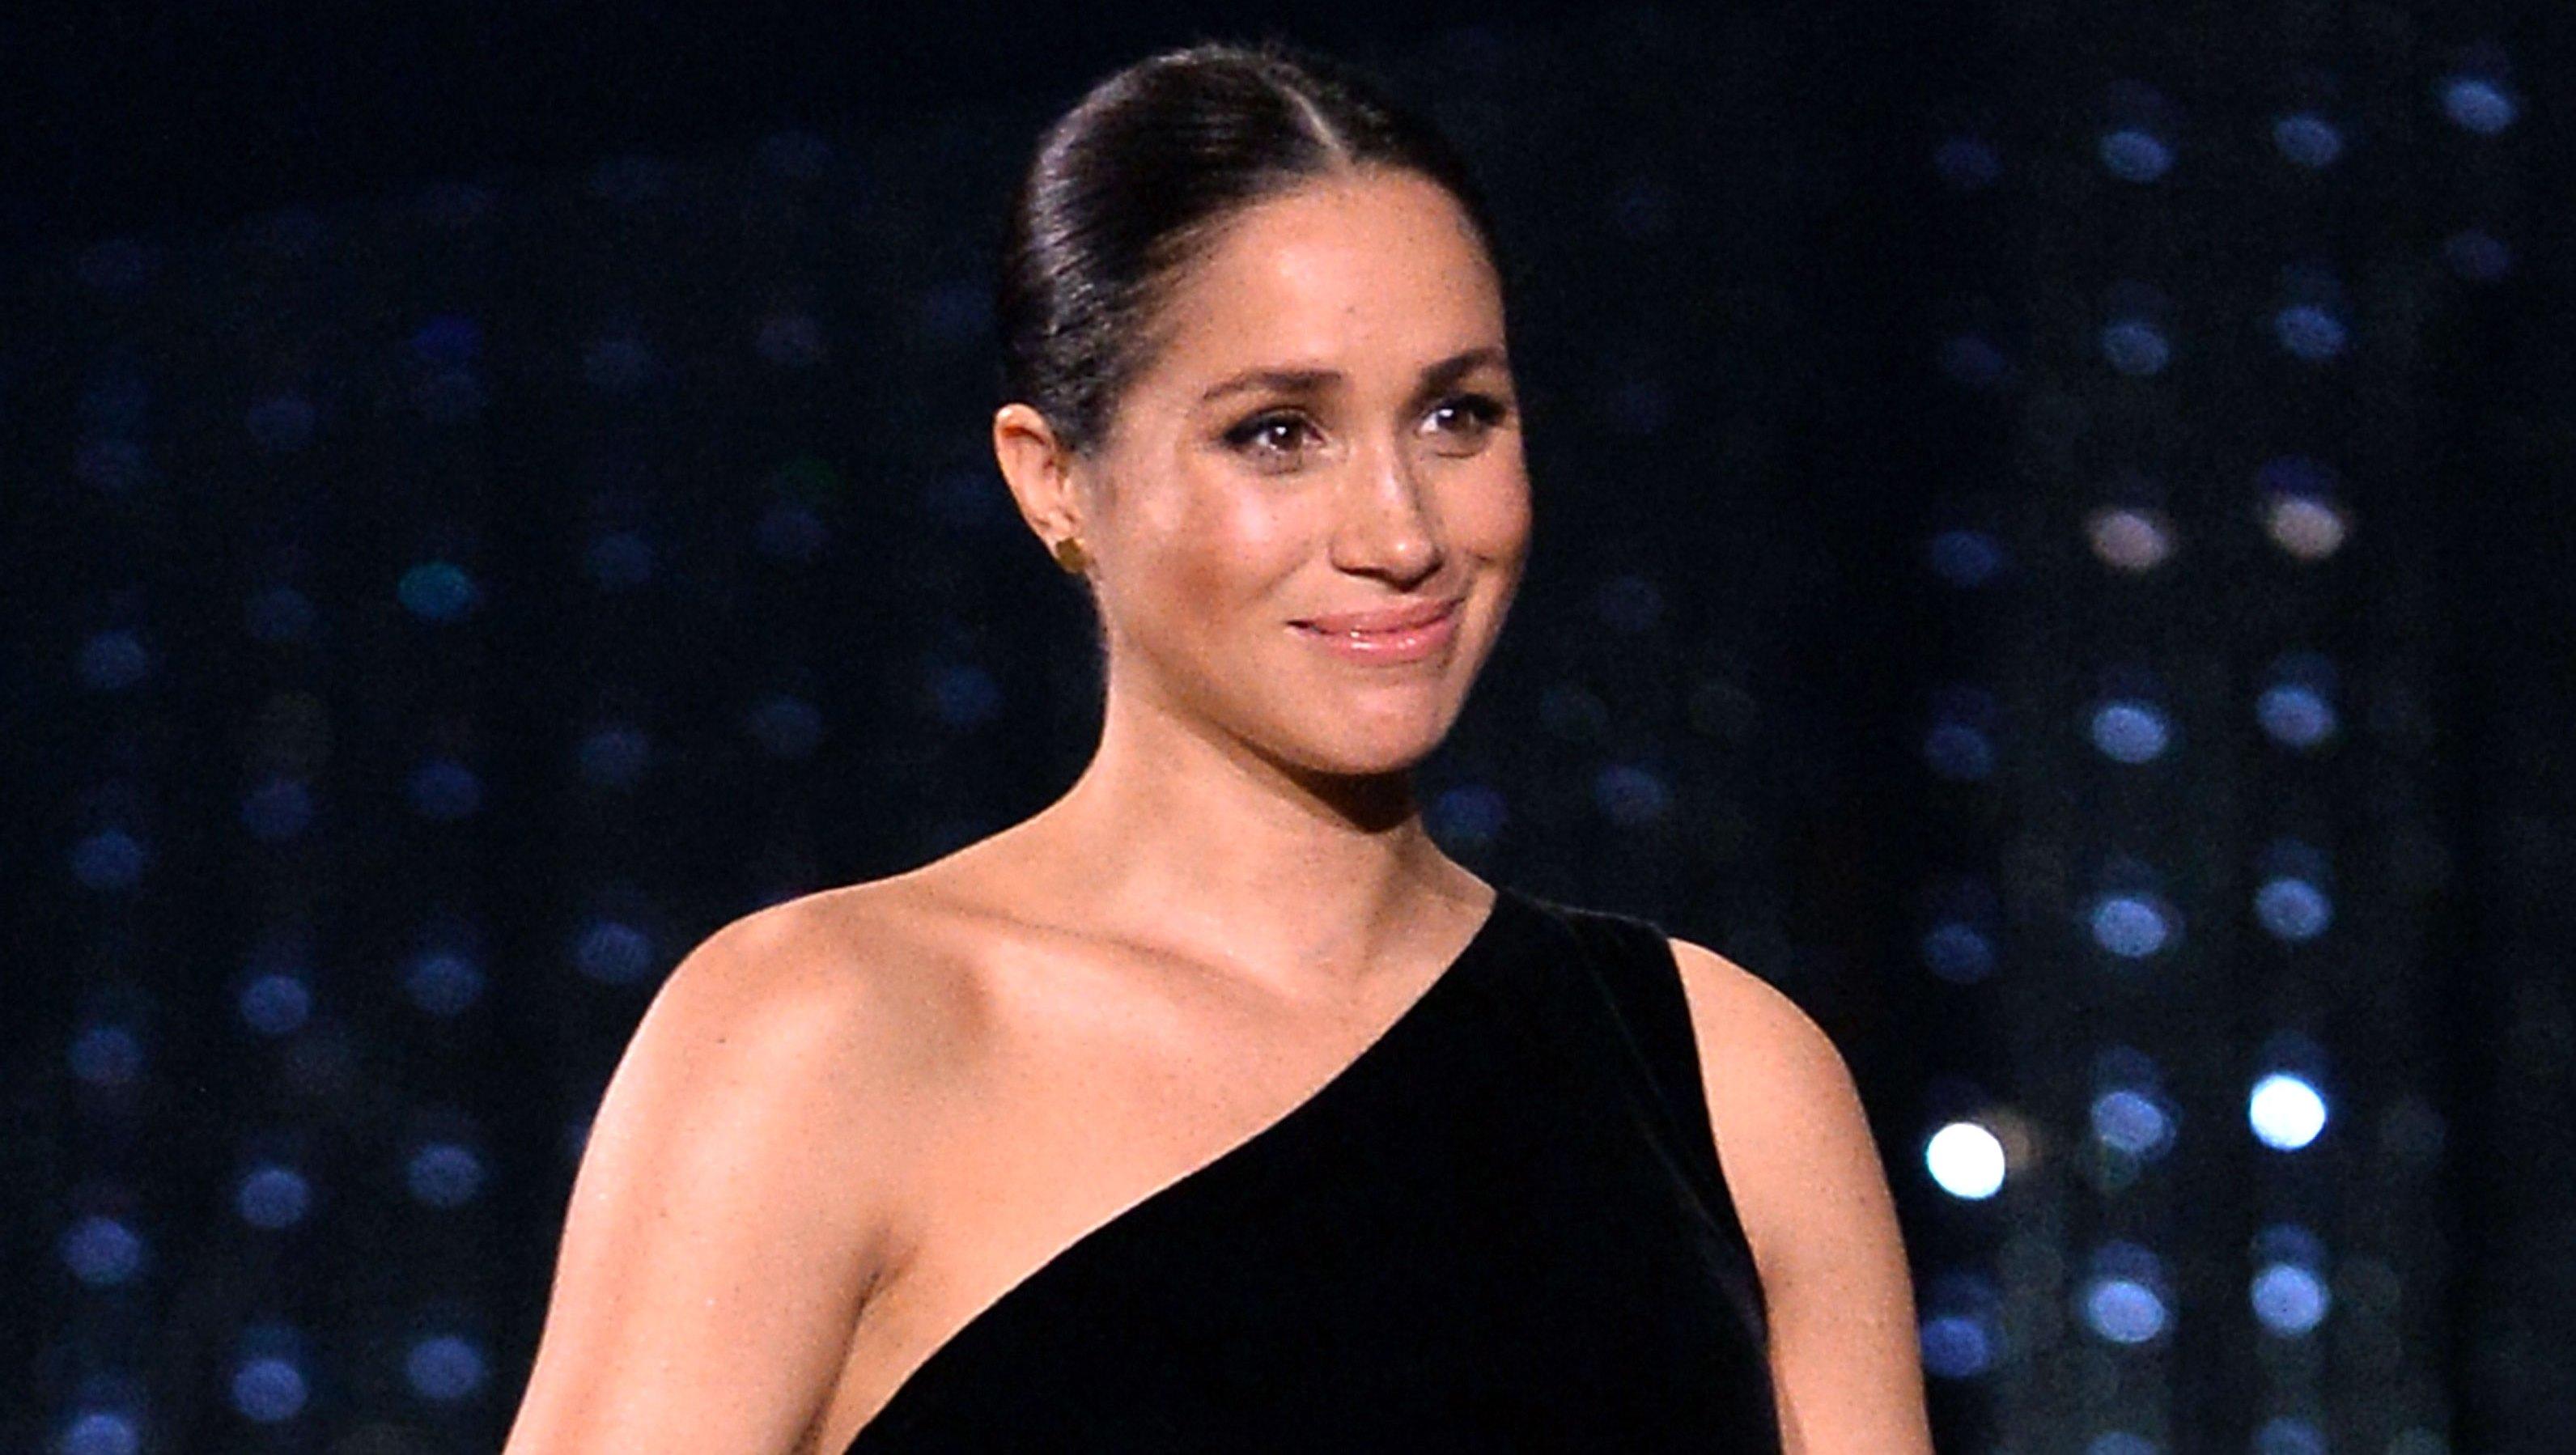 duchess meghan-markle-fashion-awards-black-dress